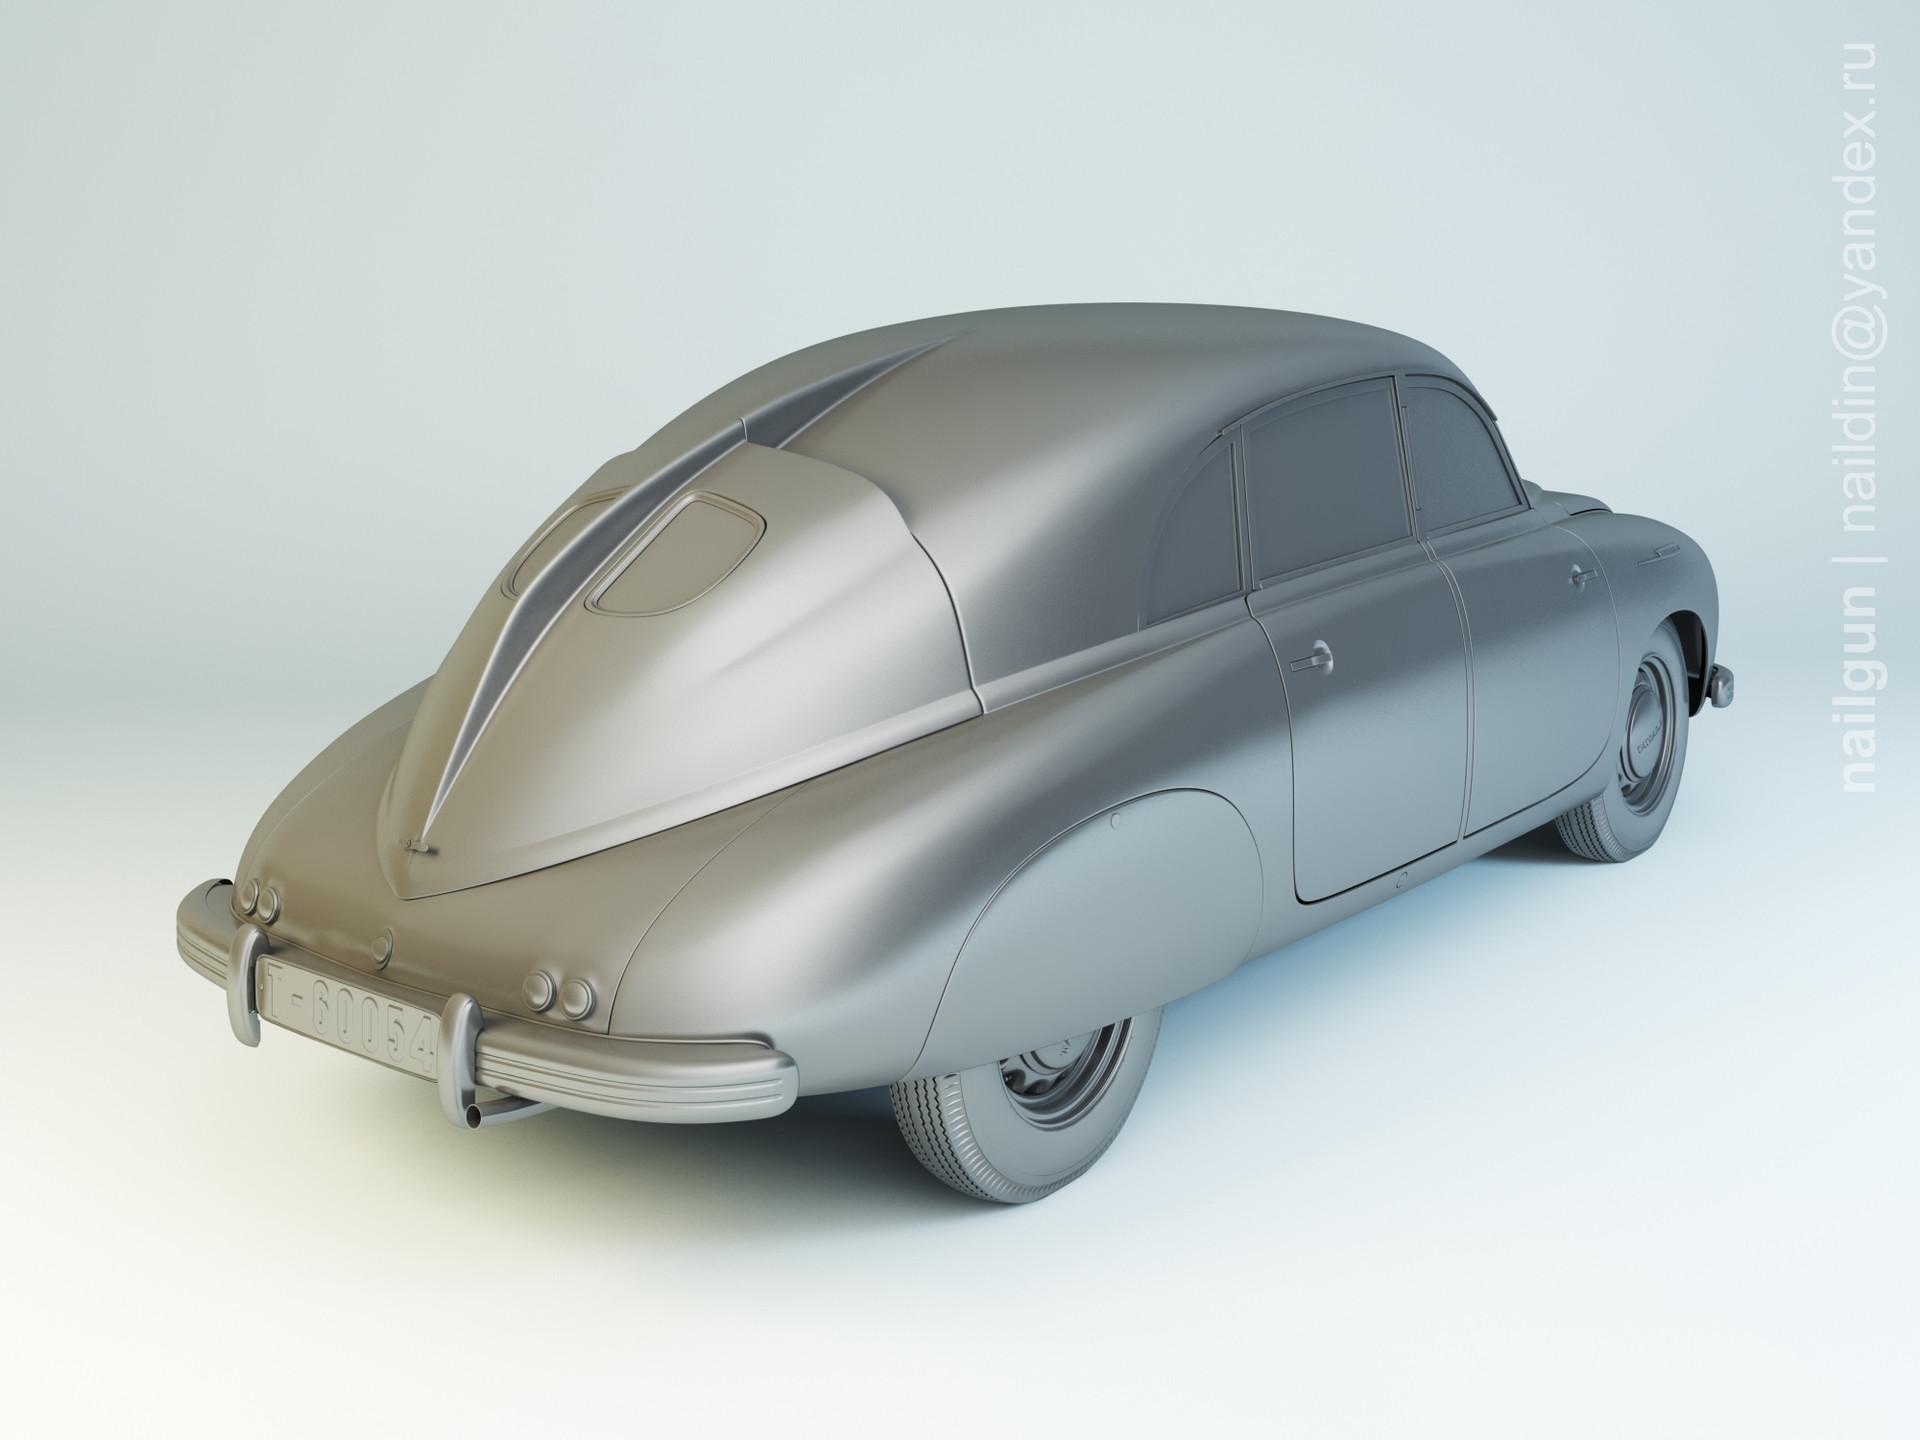 Nail khusnutdinov als 197 004 tatra t 600 modelling 1